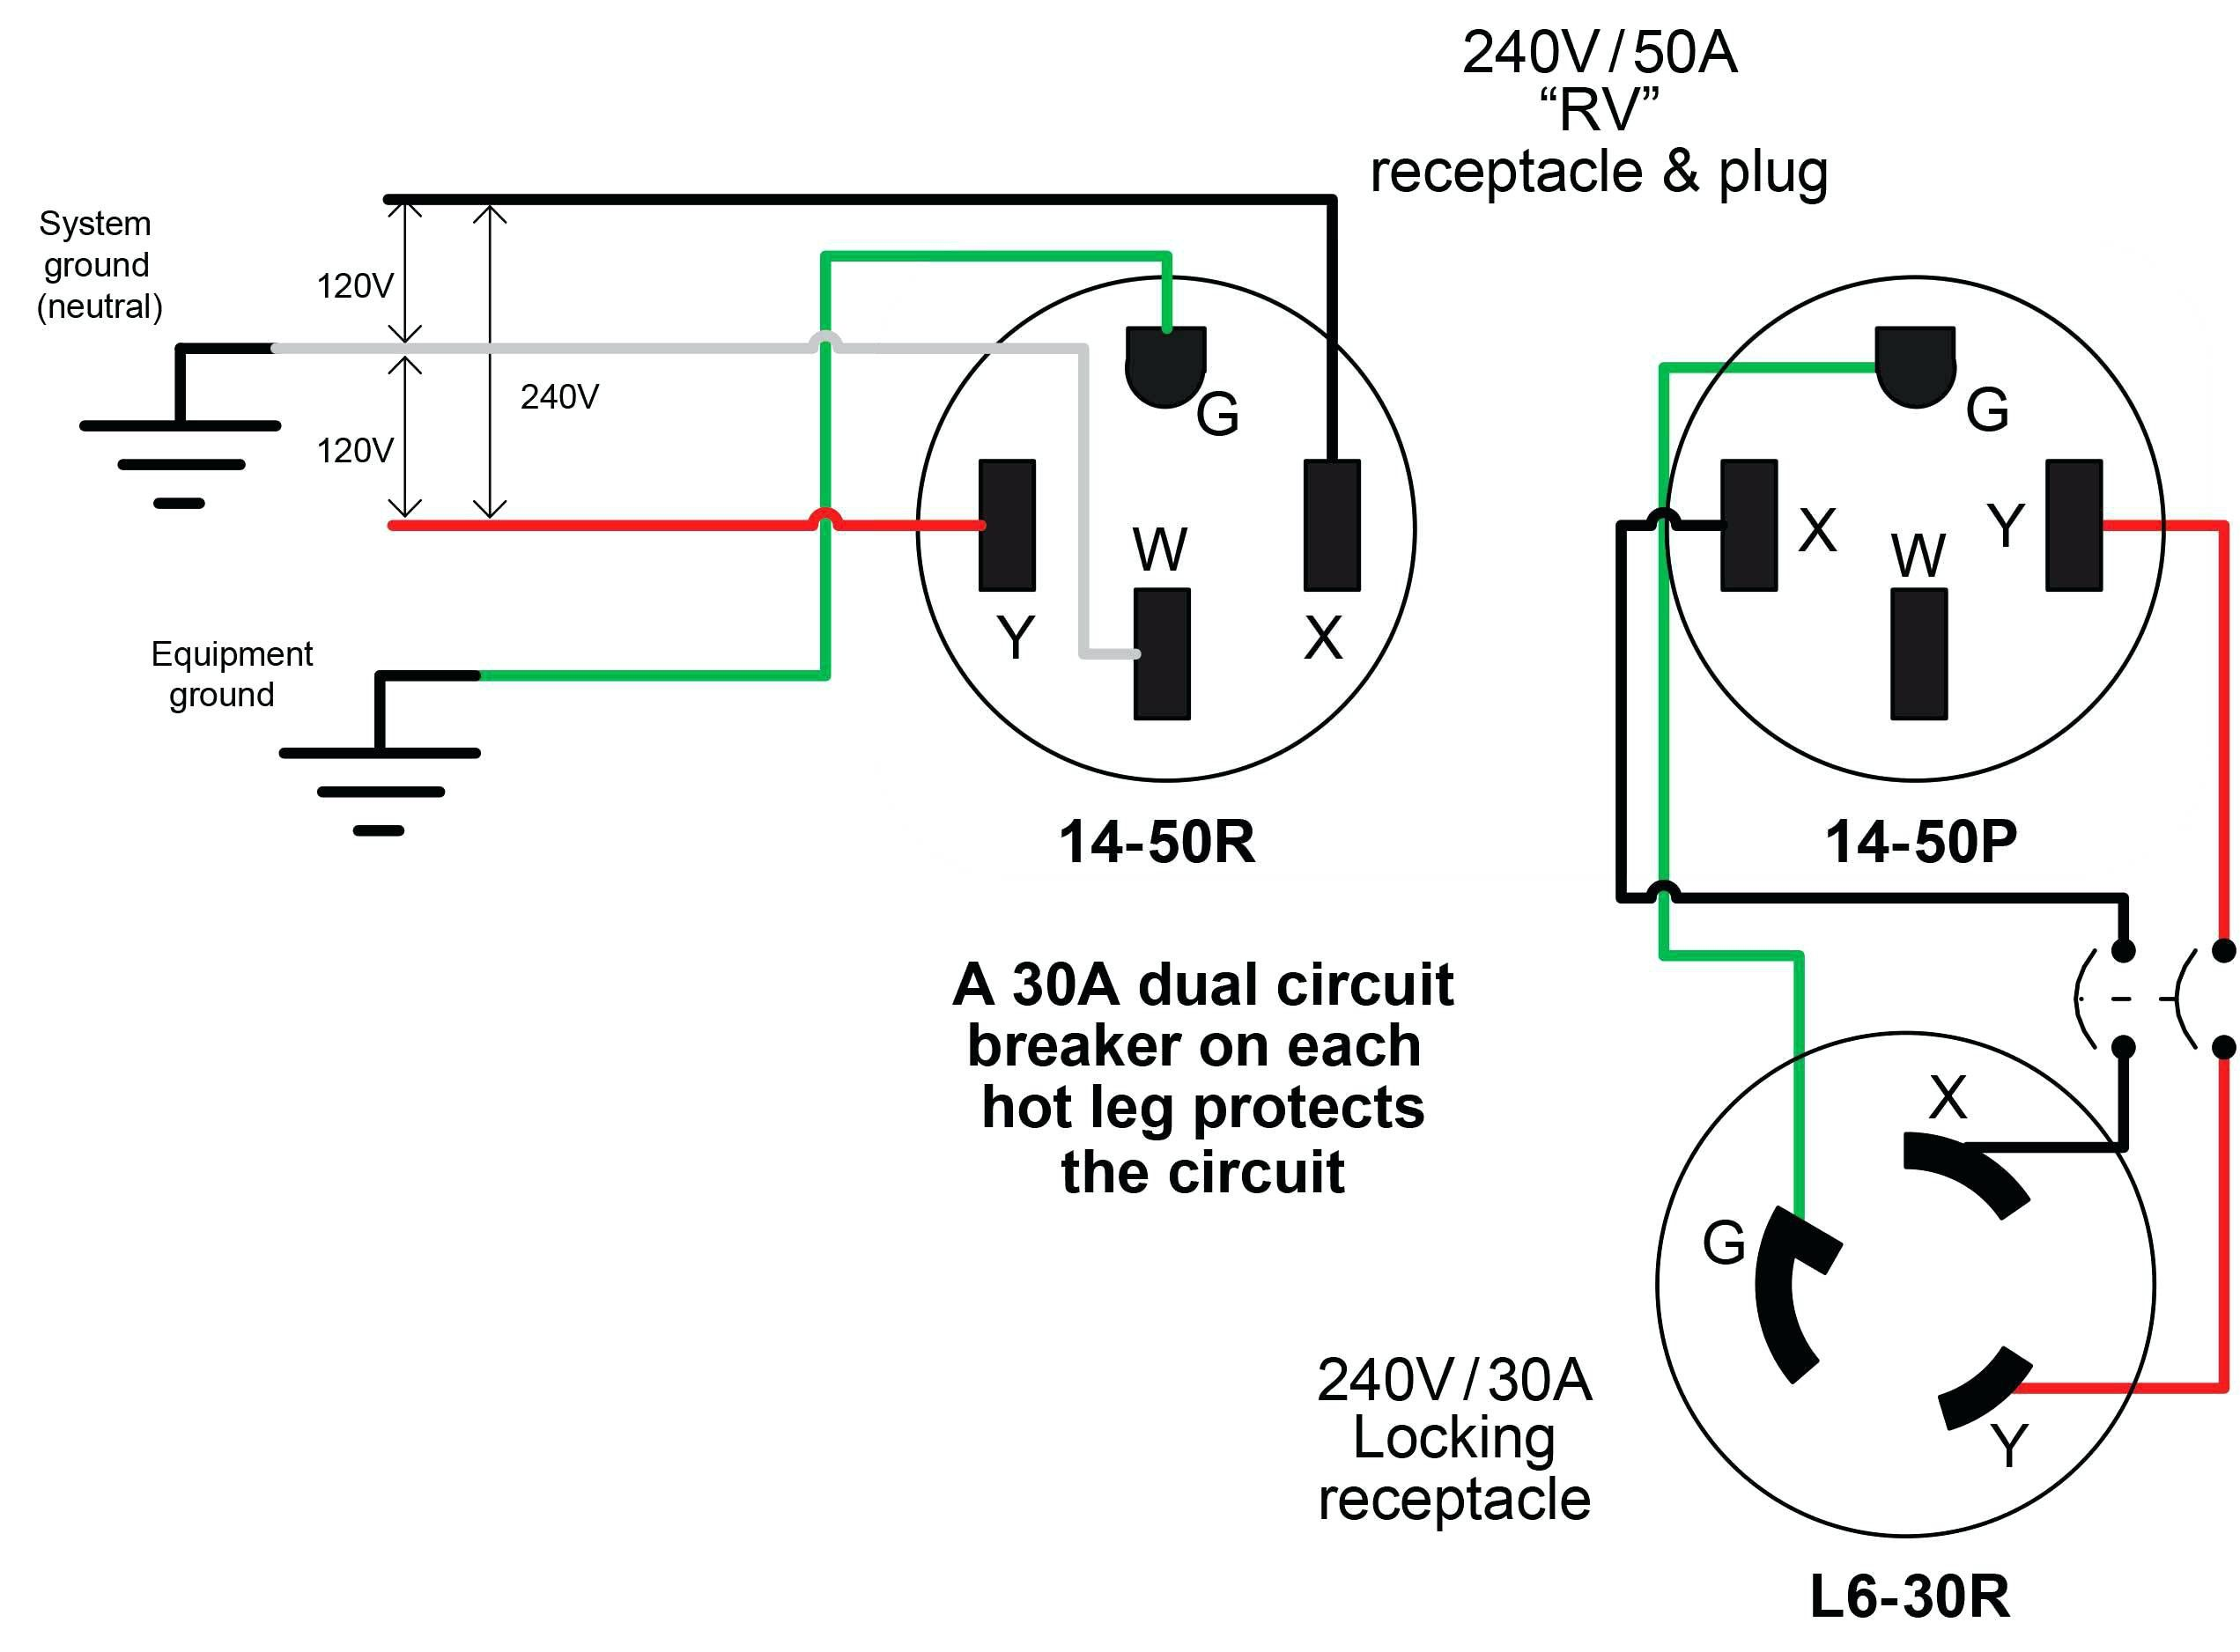 hight resolution of 240v dryer plug wiring diagram wiring diagram technic wiring diagram 240v 3 prong plug whirlpool washing machine wiring